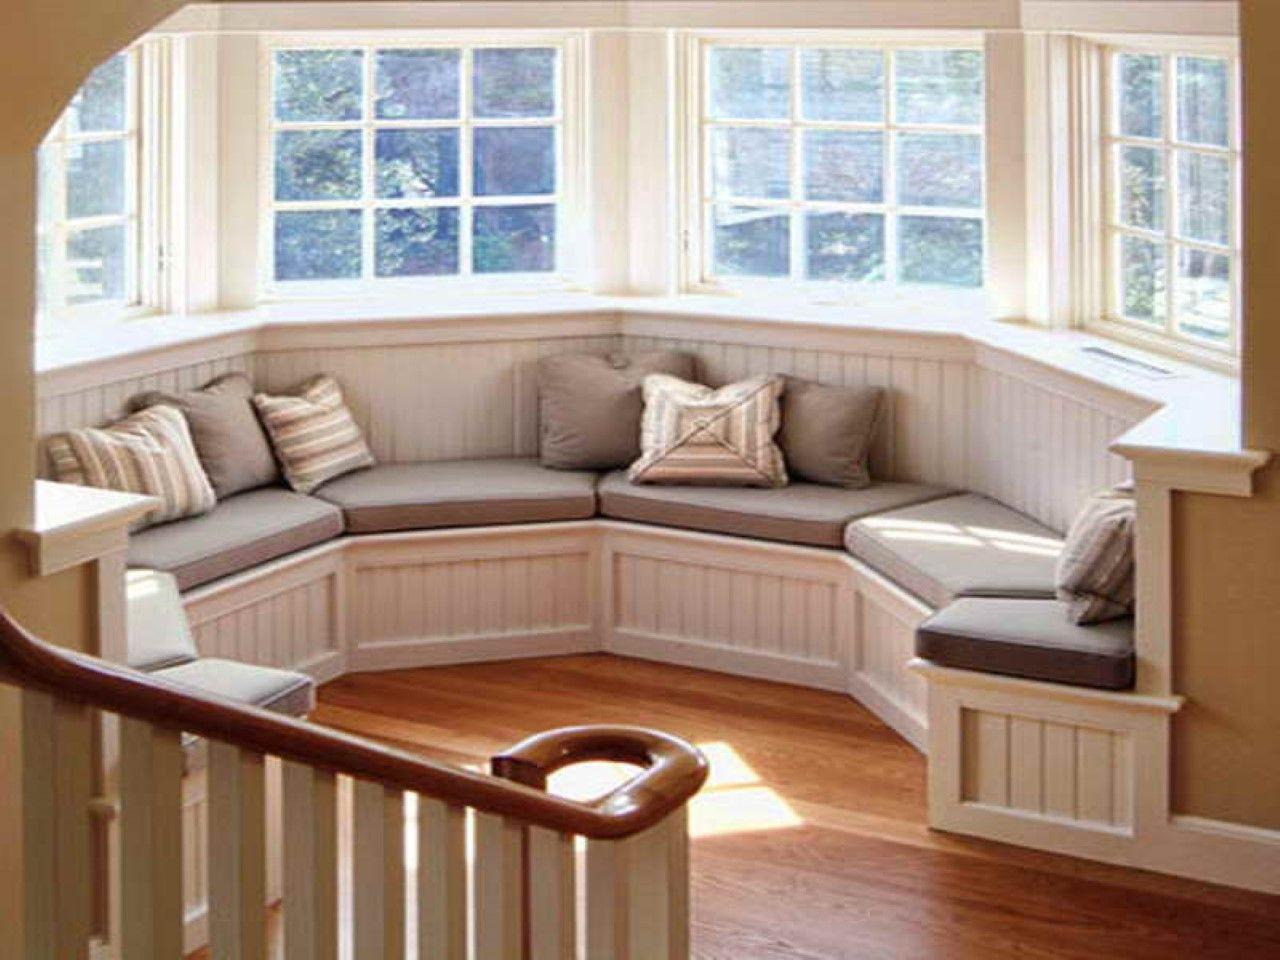 Kitchen living room window  astonishing bay window seating  furniture  homeepedia